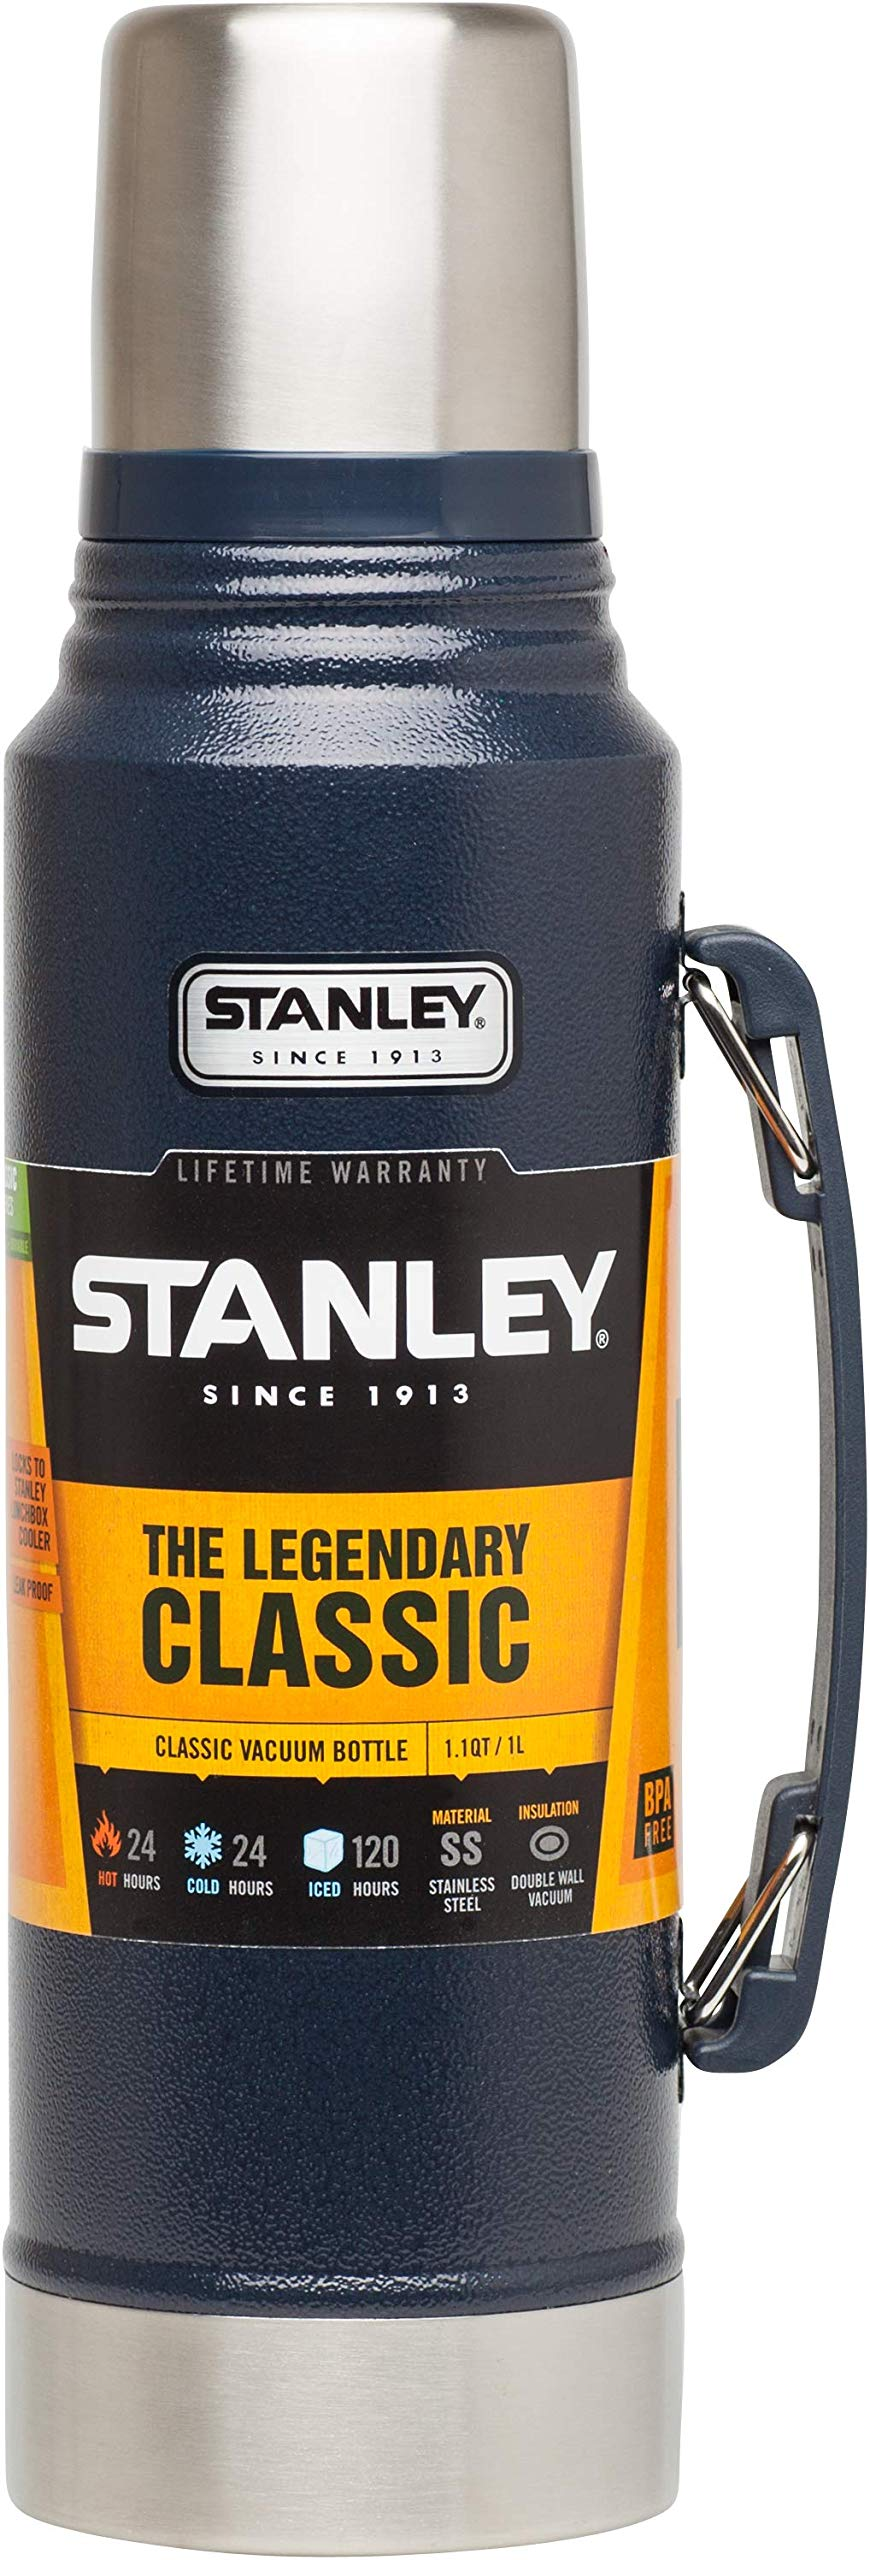 Stanley Vakuumflasche - Frasco, Color Azul Marino, Talla 1.3L product image